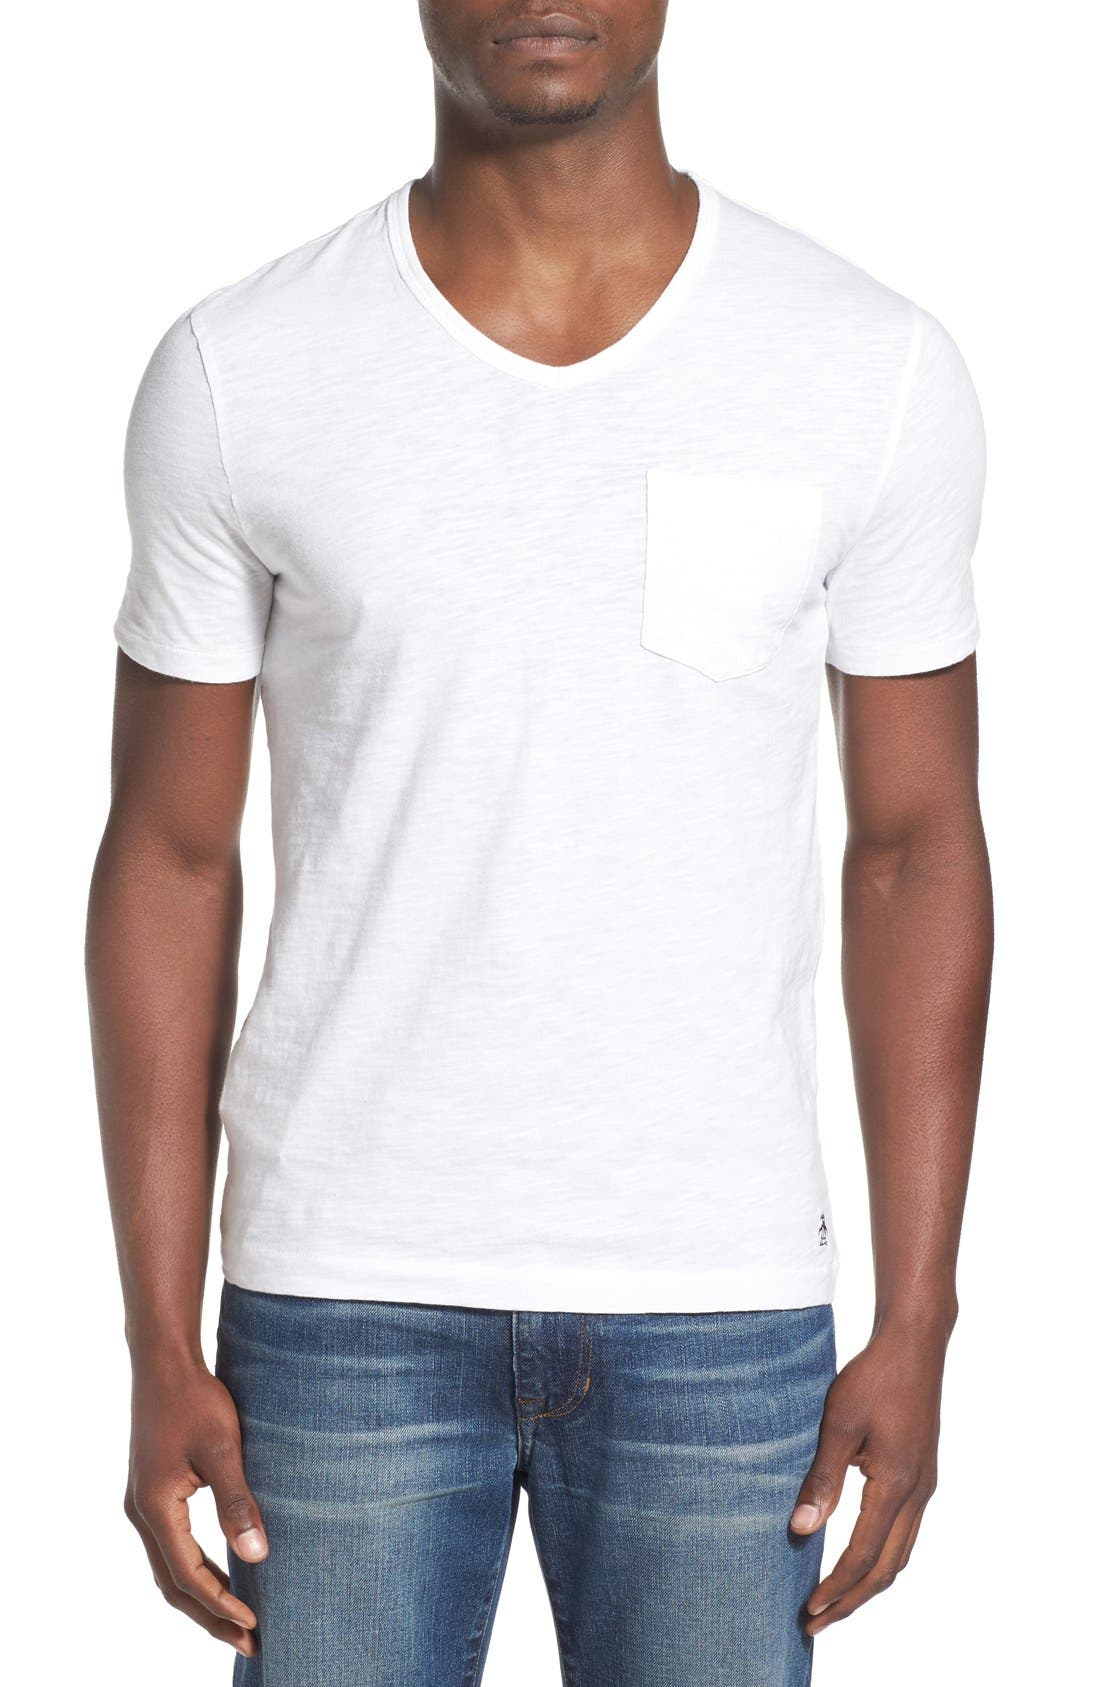 Main Image - Original Penguin 'Bing' V-Neck Pocket T-Shirt